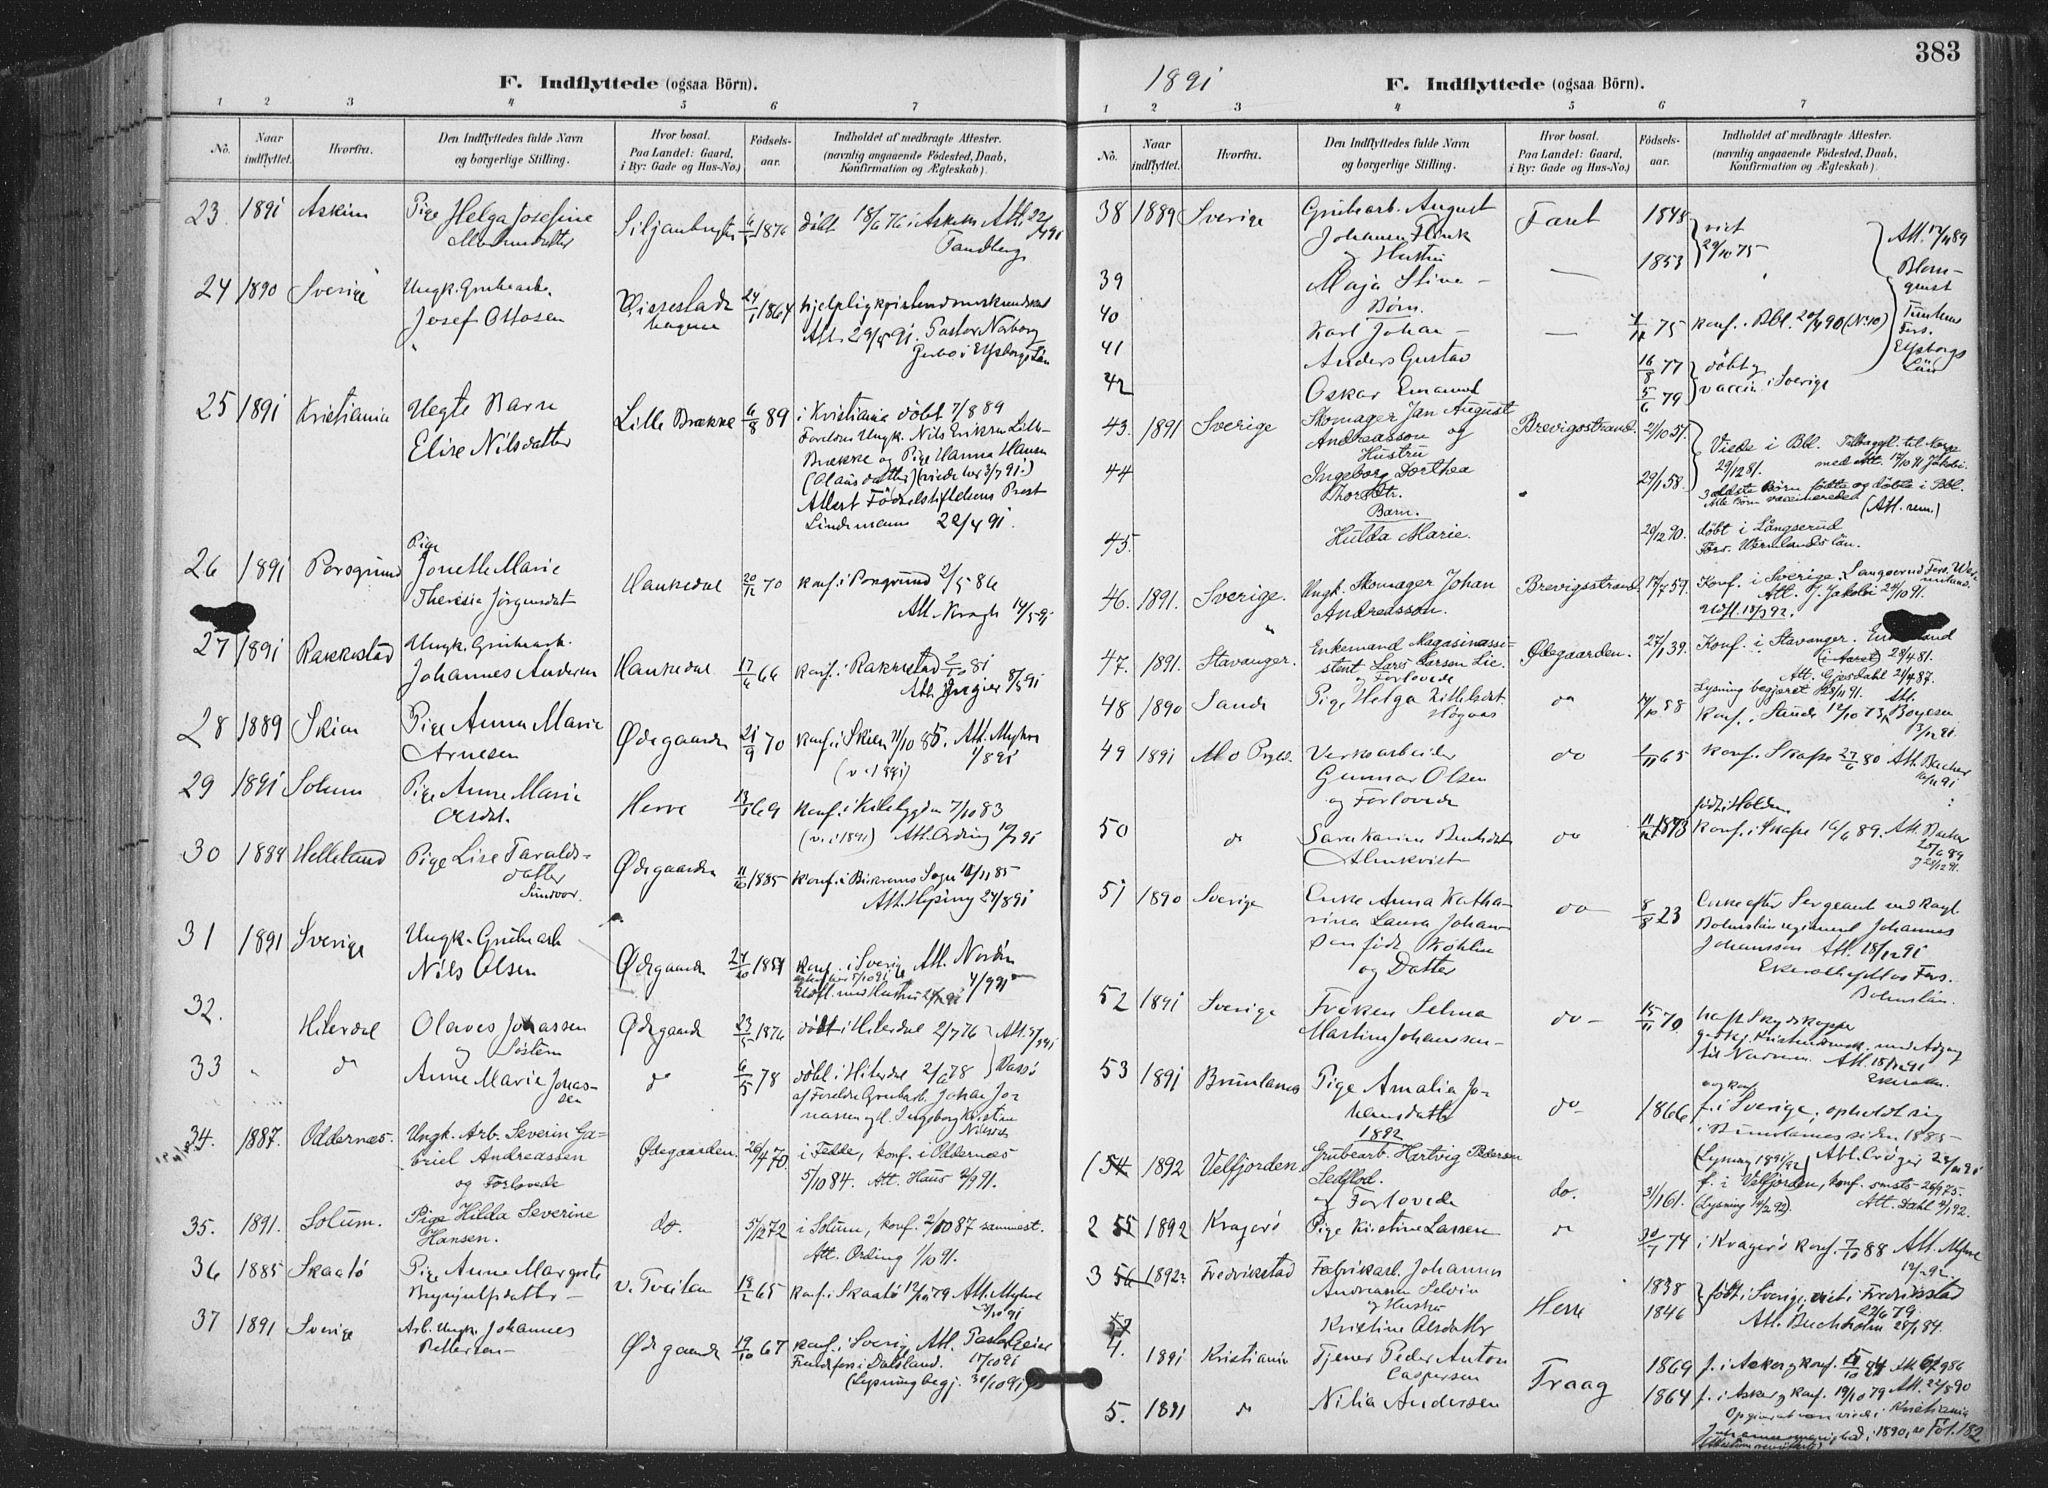 SAKO, Bamble kirkebøker, F/Fa/L0008: Ministerialbok nr. I 8, 1888-1900, s. 383